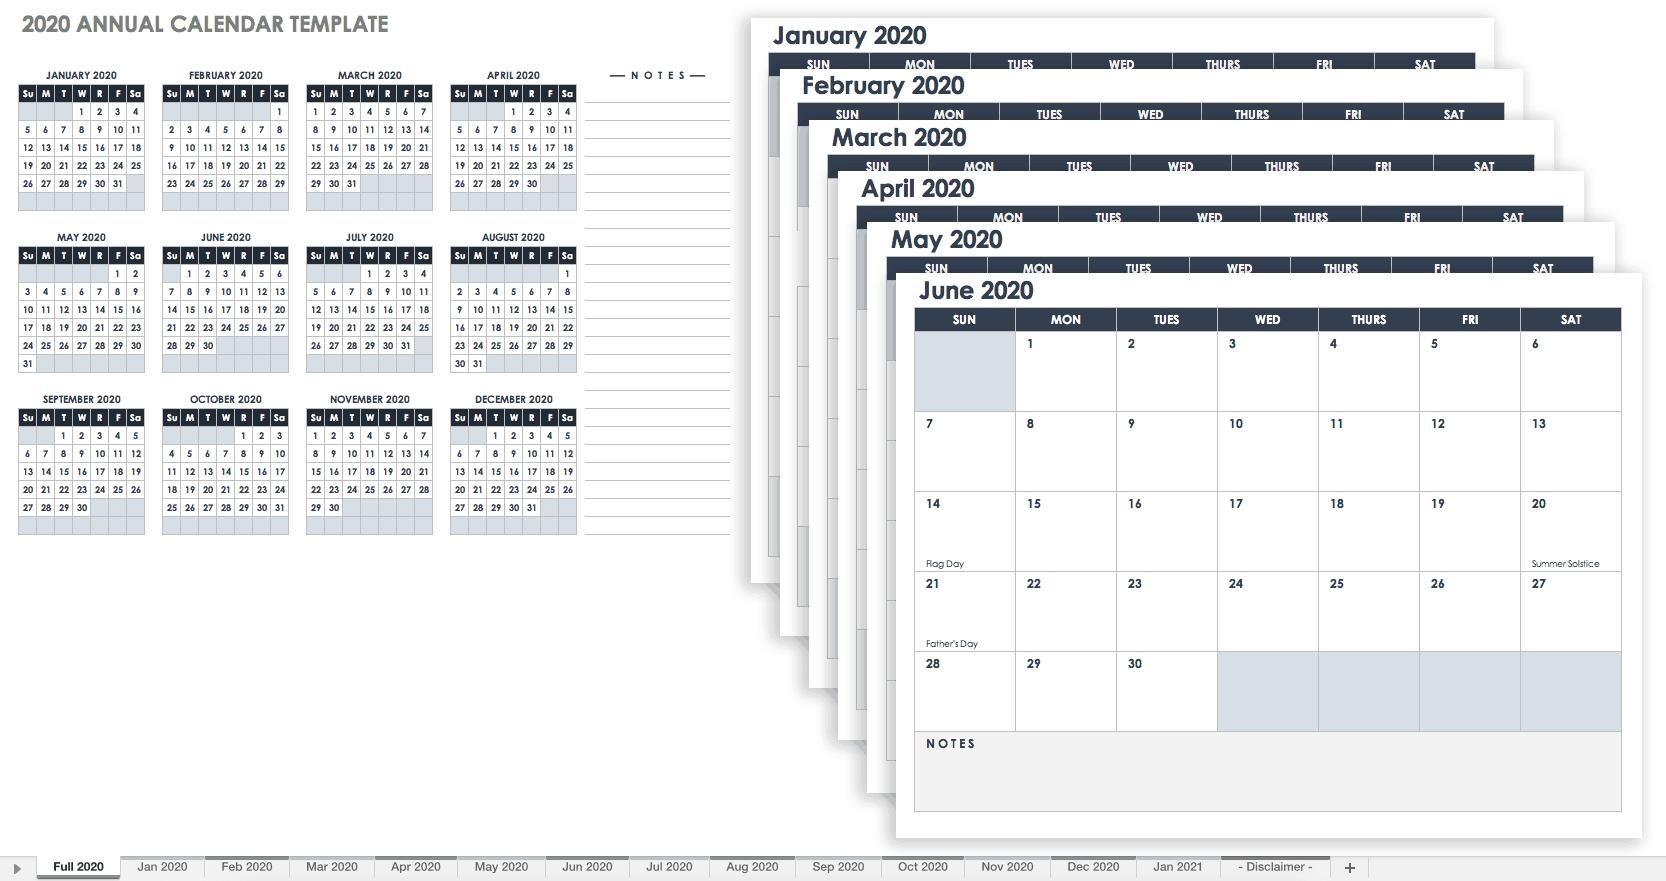 Free Blank Calendar Templates - Smartsheet-Editable 3 Month Calendar Template 2020